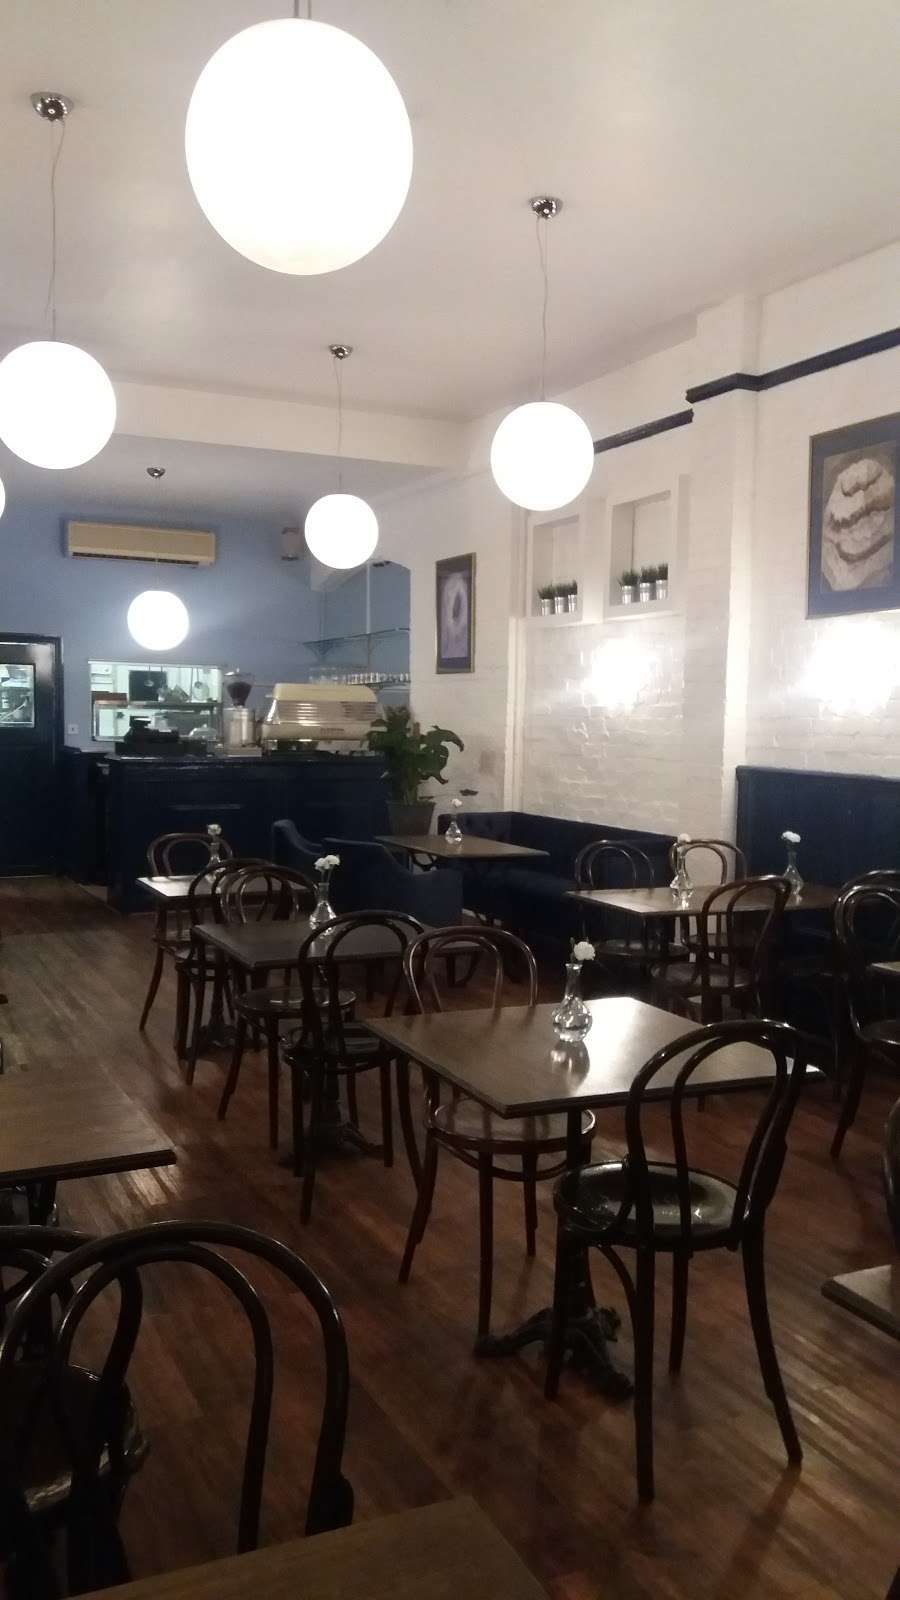 STELLAS ROOM - cafe  | Photo 3 of 10 | Address: 46 Fortis Green Rd, London N10 3HN, UK | Phone: 07789 250612